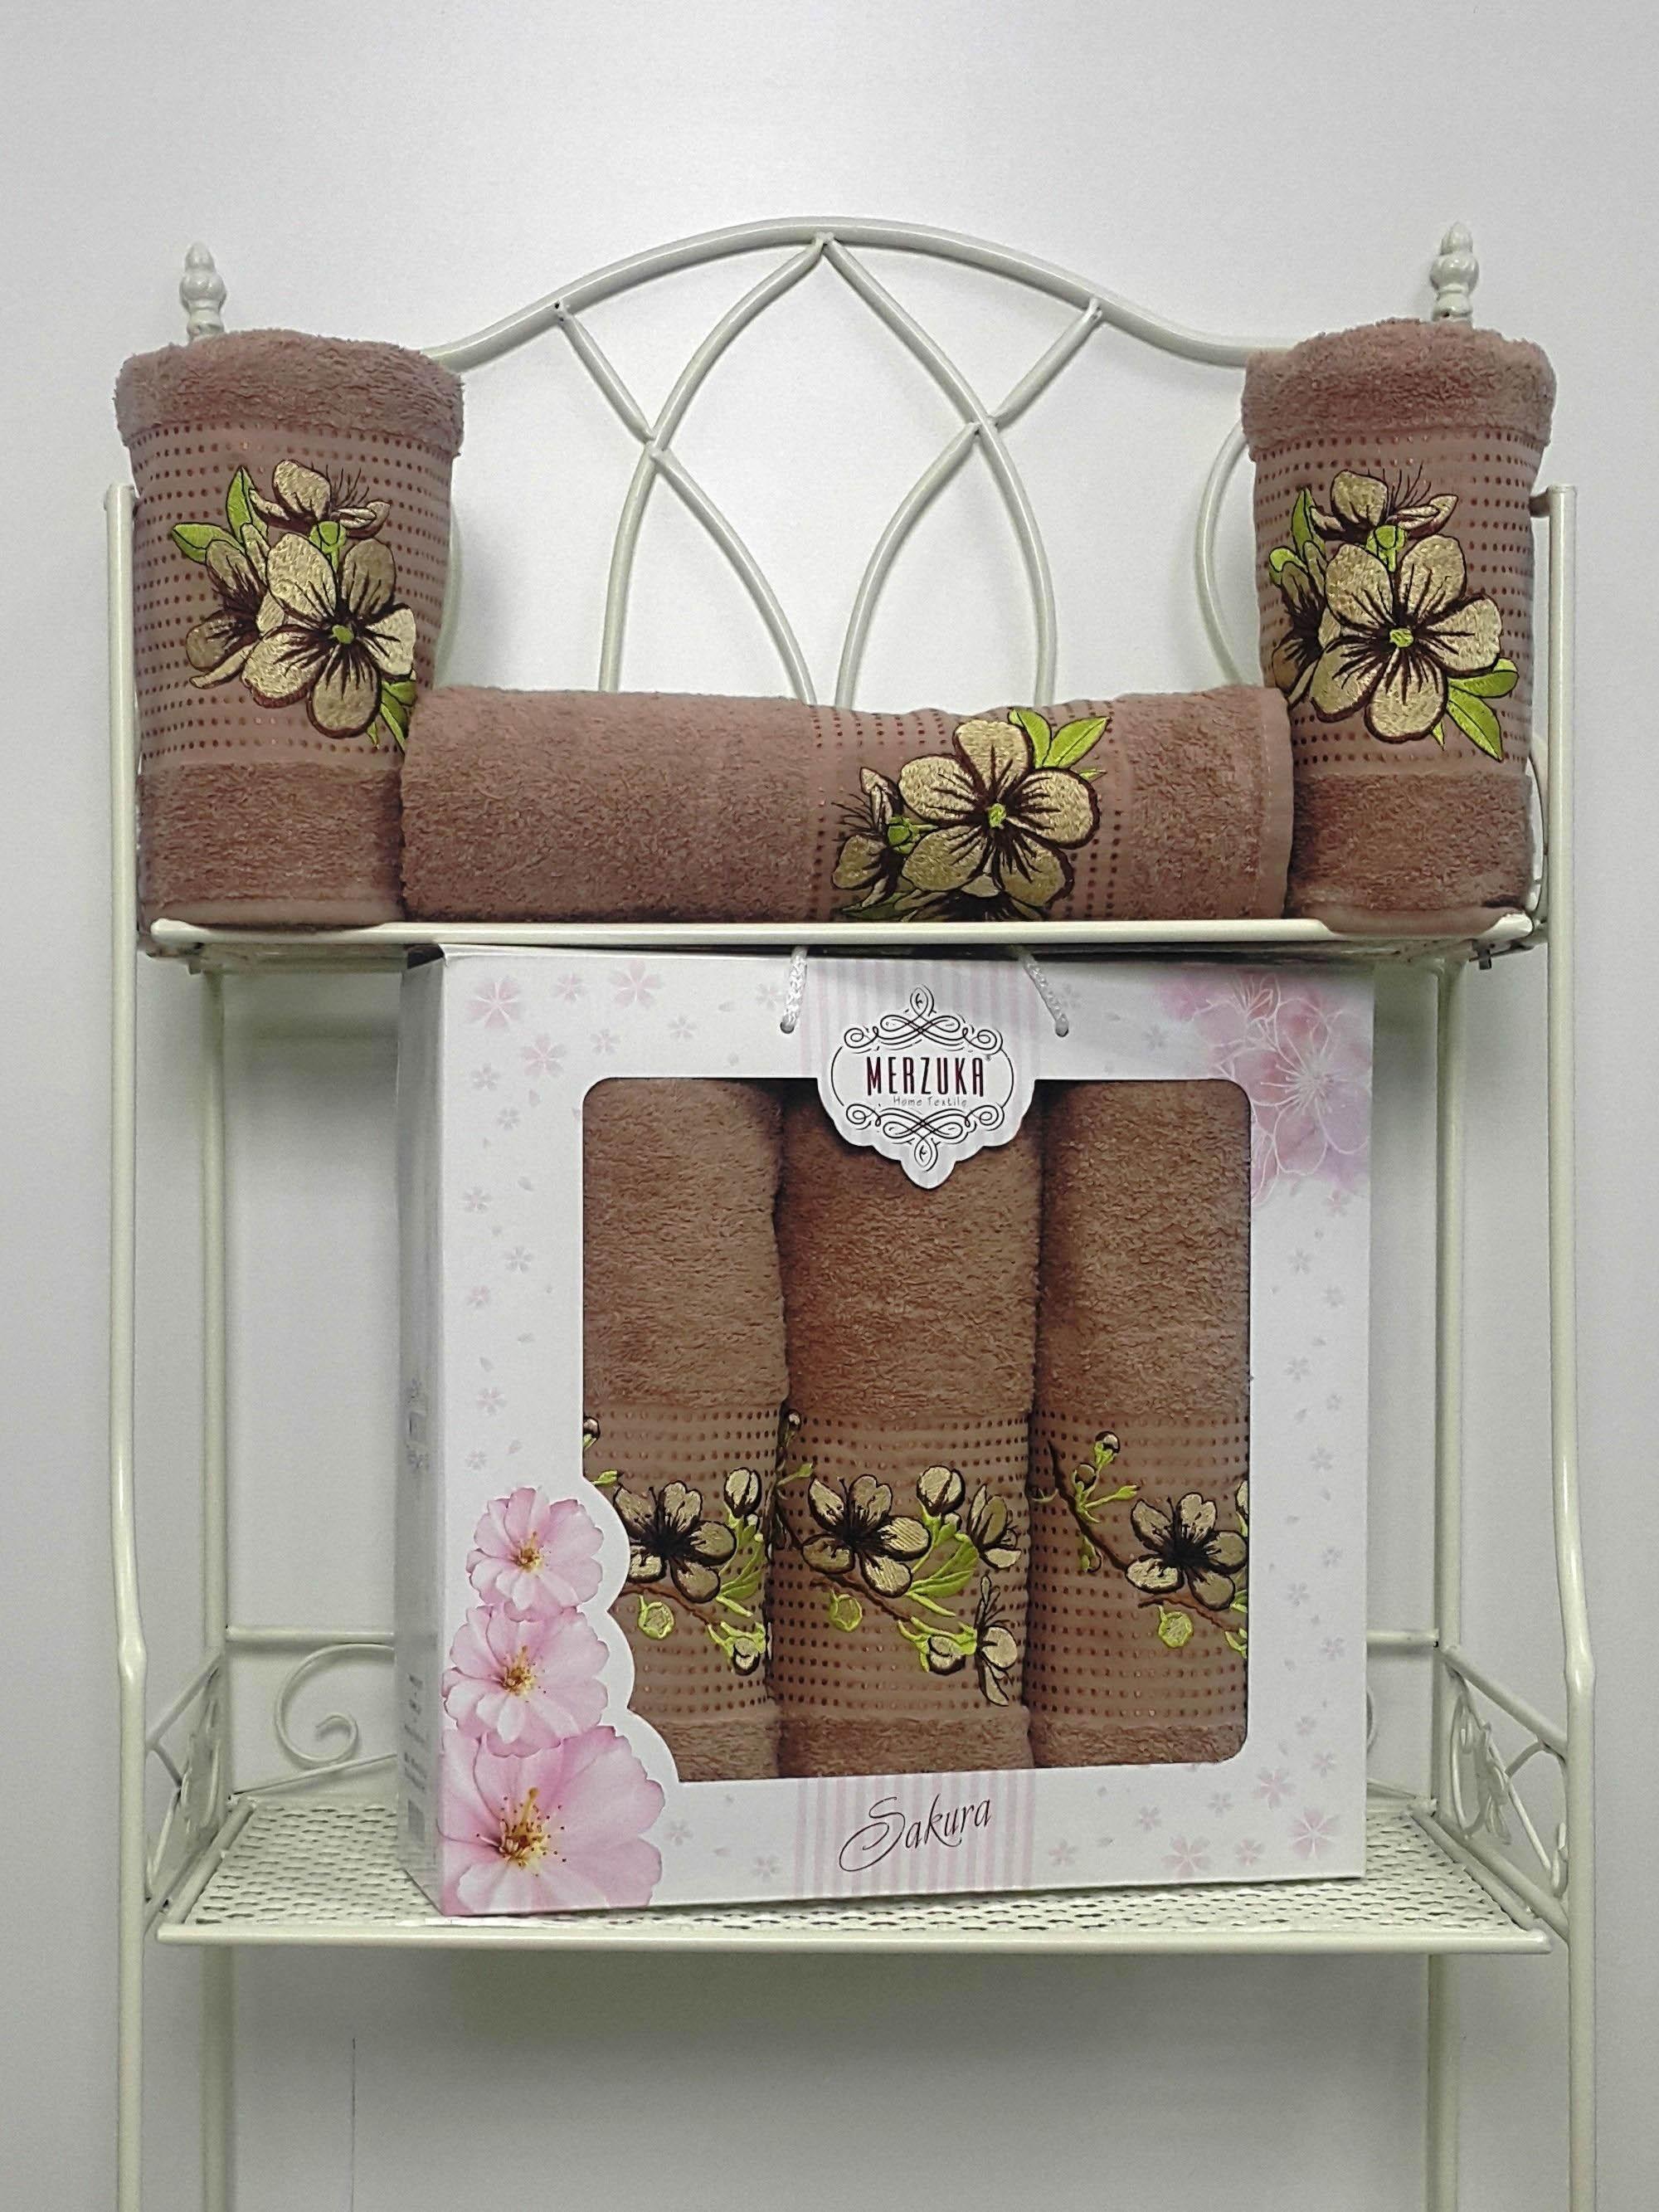 Полотенца Oran Merzuka Полотенце Sakura Цвет: Коричневый (Набор) полотенца oran merzuka полотенце sakura цвет светло лиловый набор